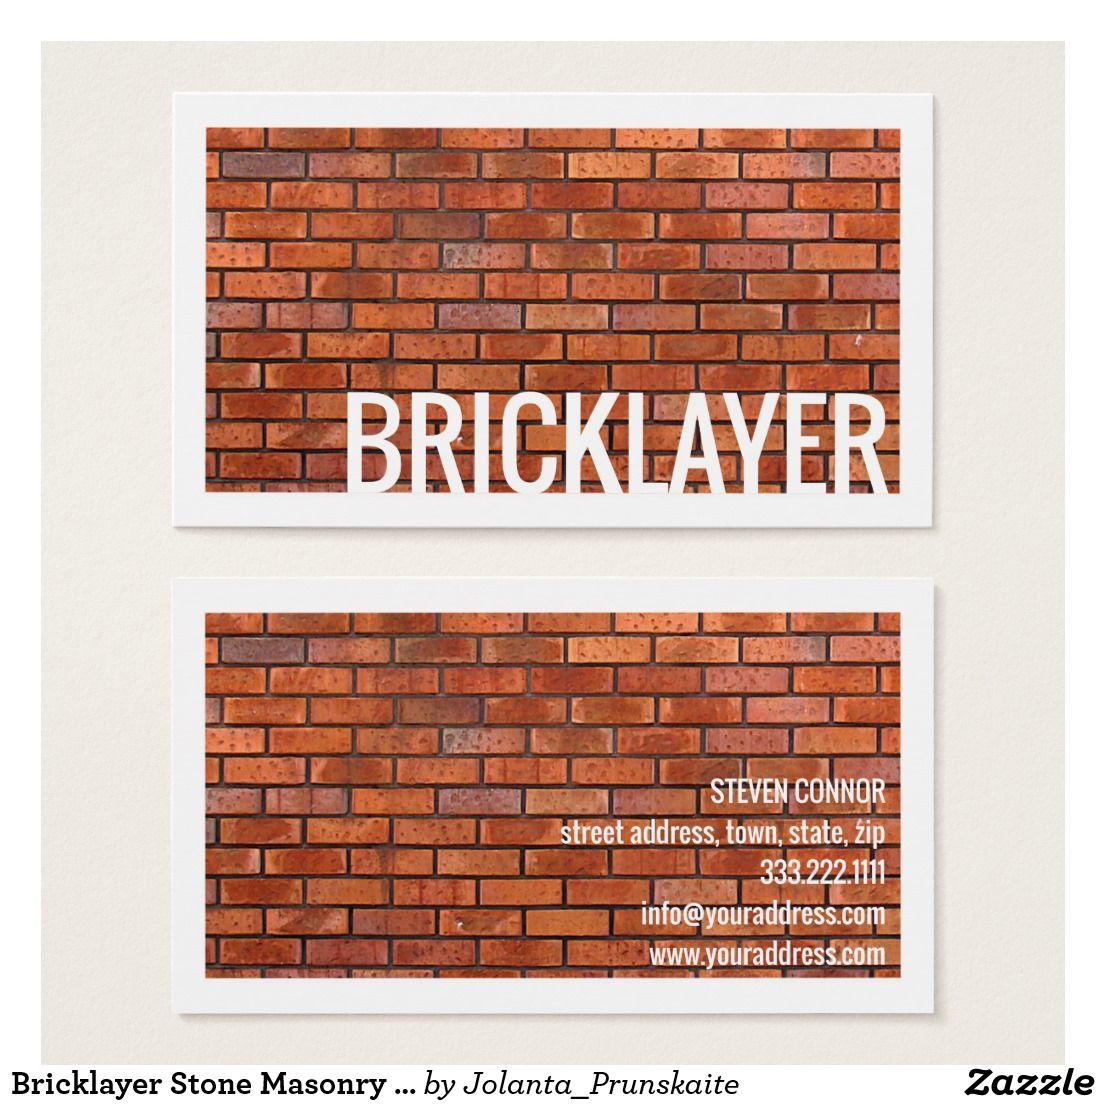 Bricklayer Stone Masonry White Border Card